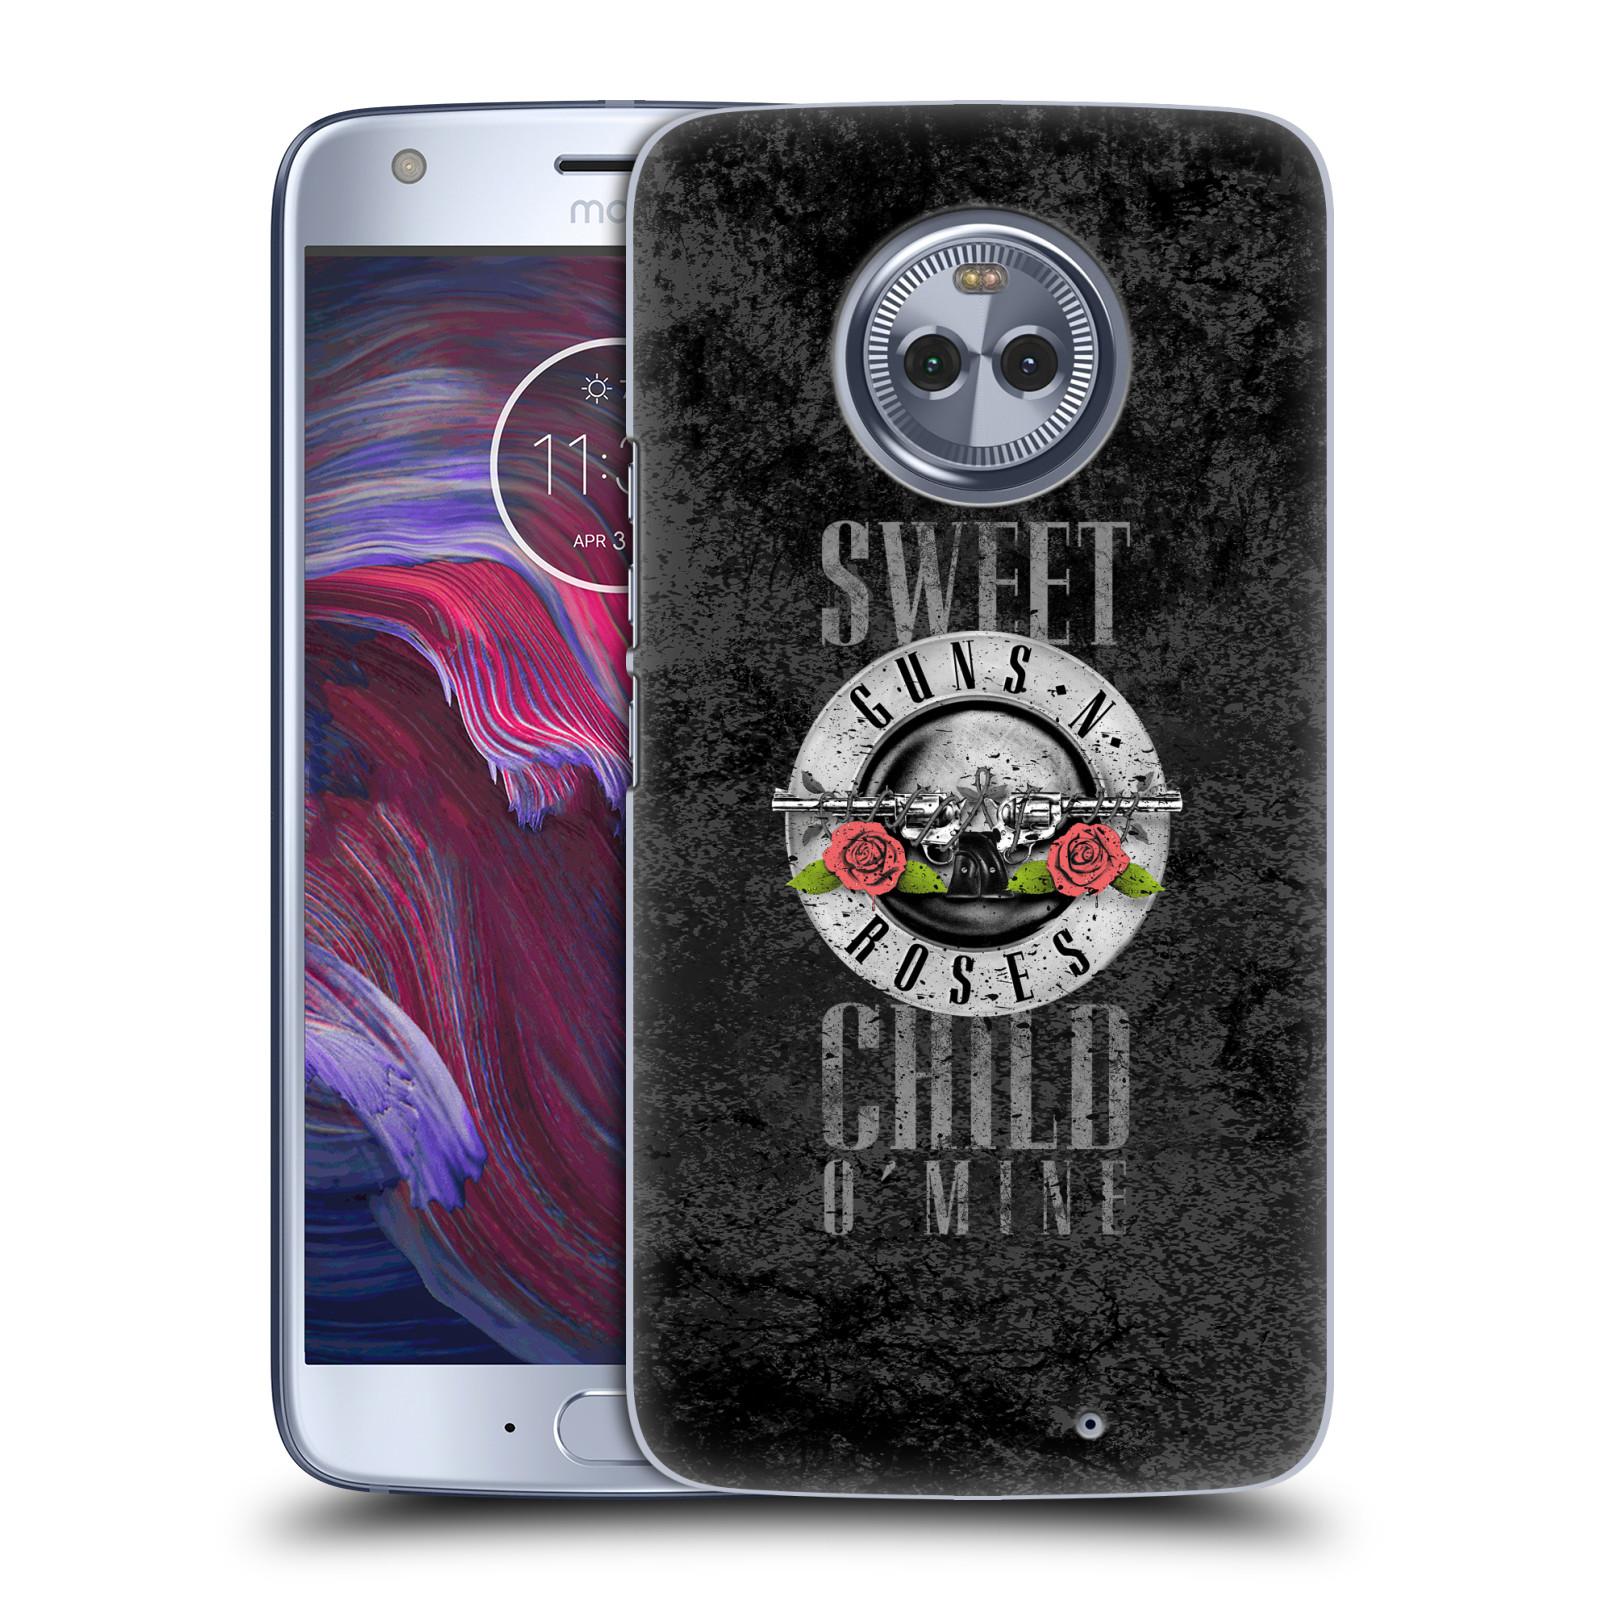 Plastové pouzdro na mobil Lenovo Moto X4 - Head Case - Guns N' Roses - Sweet Child